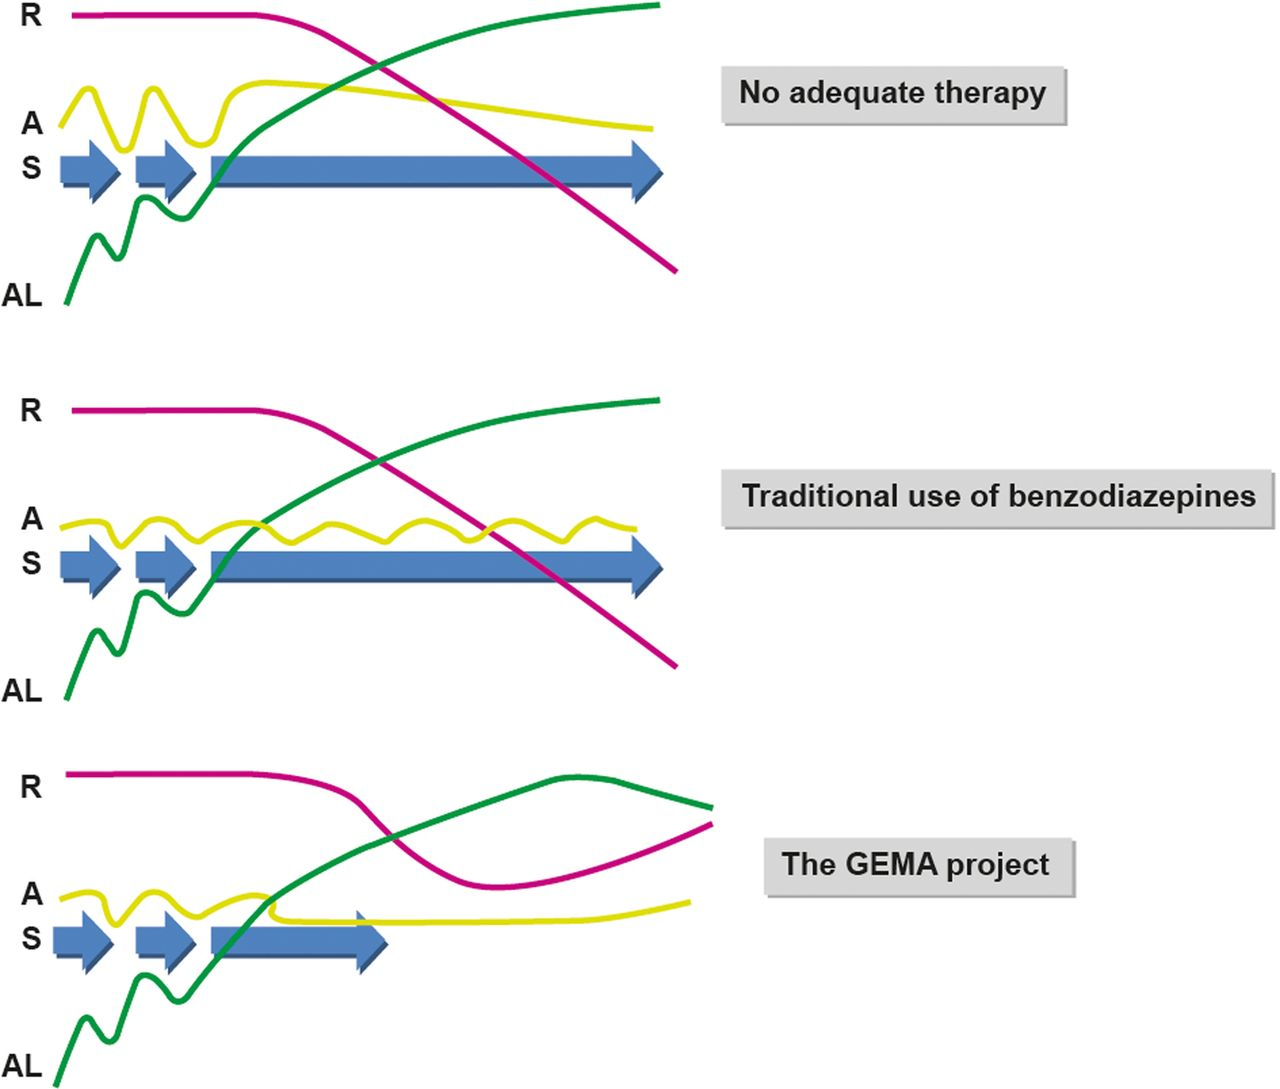 Impact of alprazolam in allostatic load and neurocognition